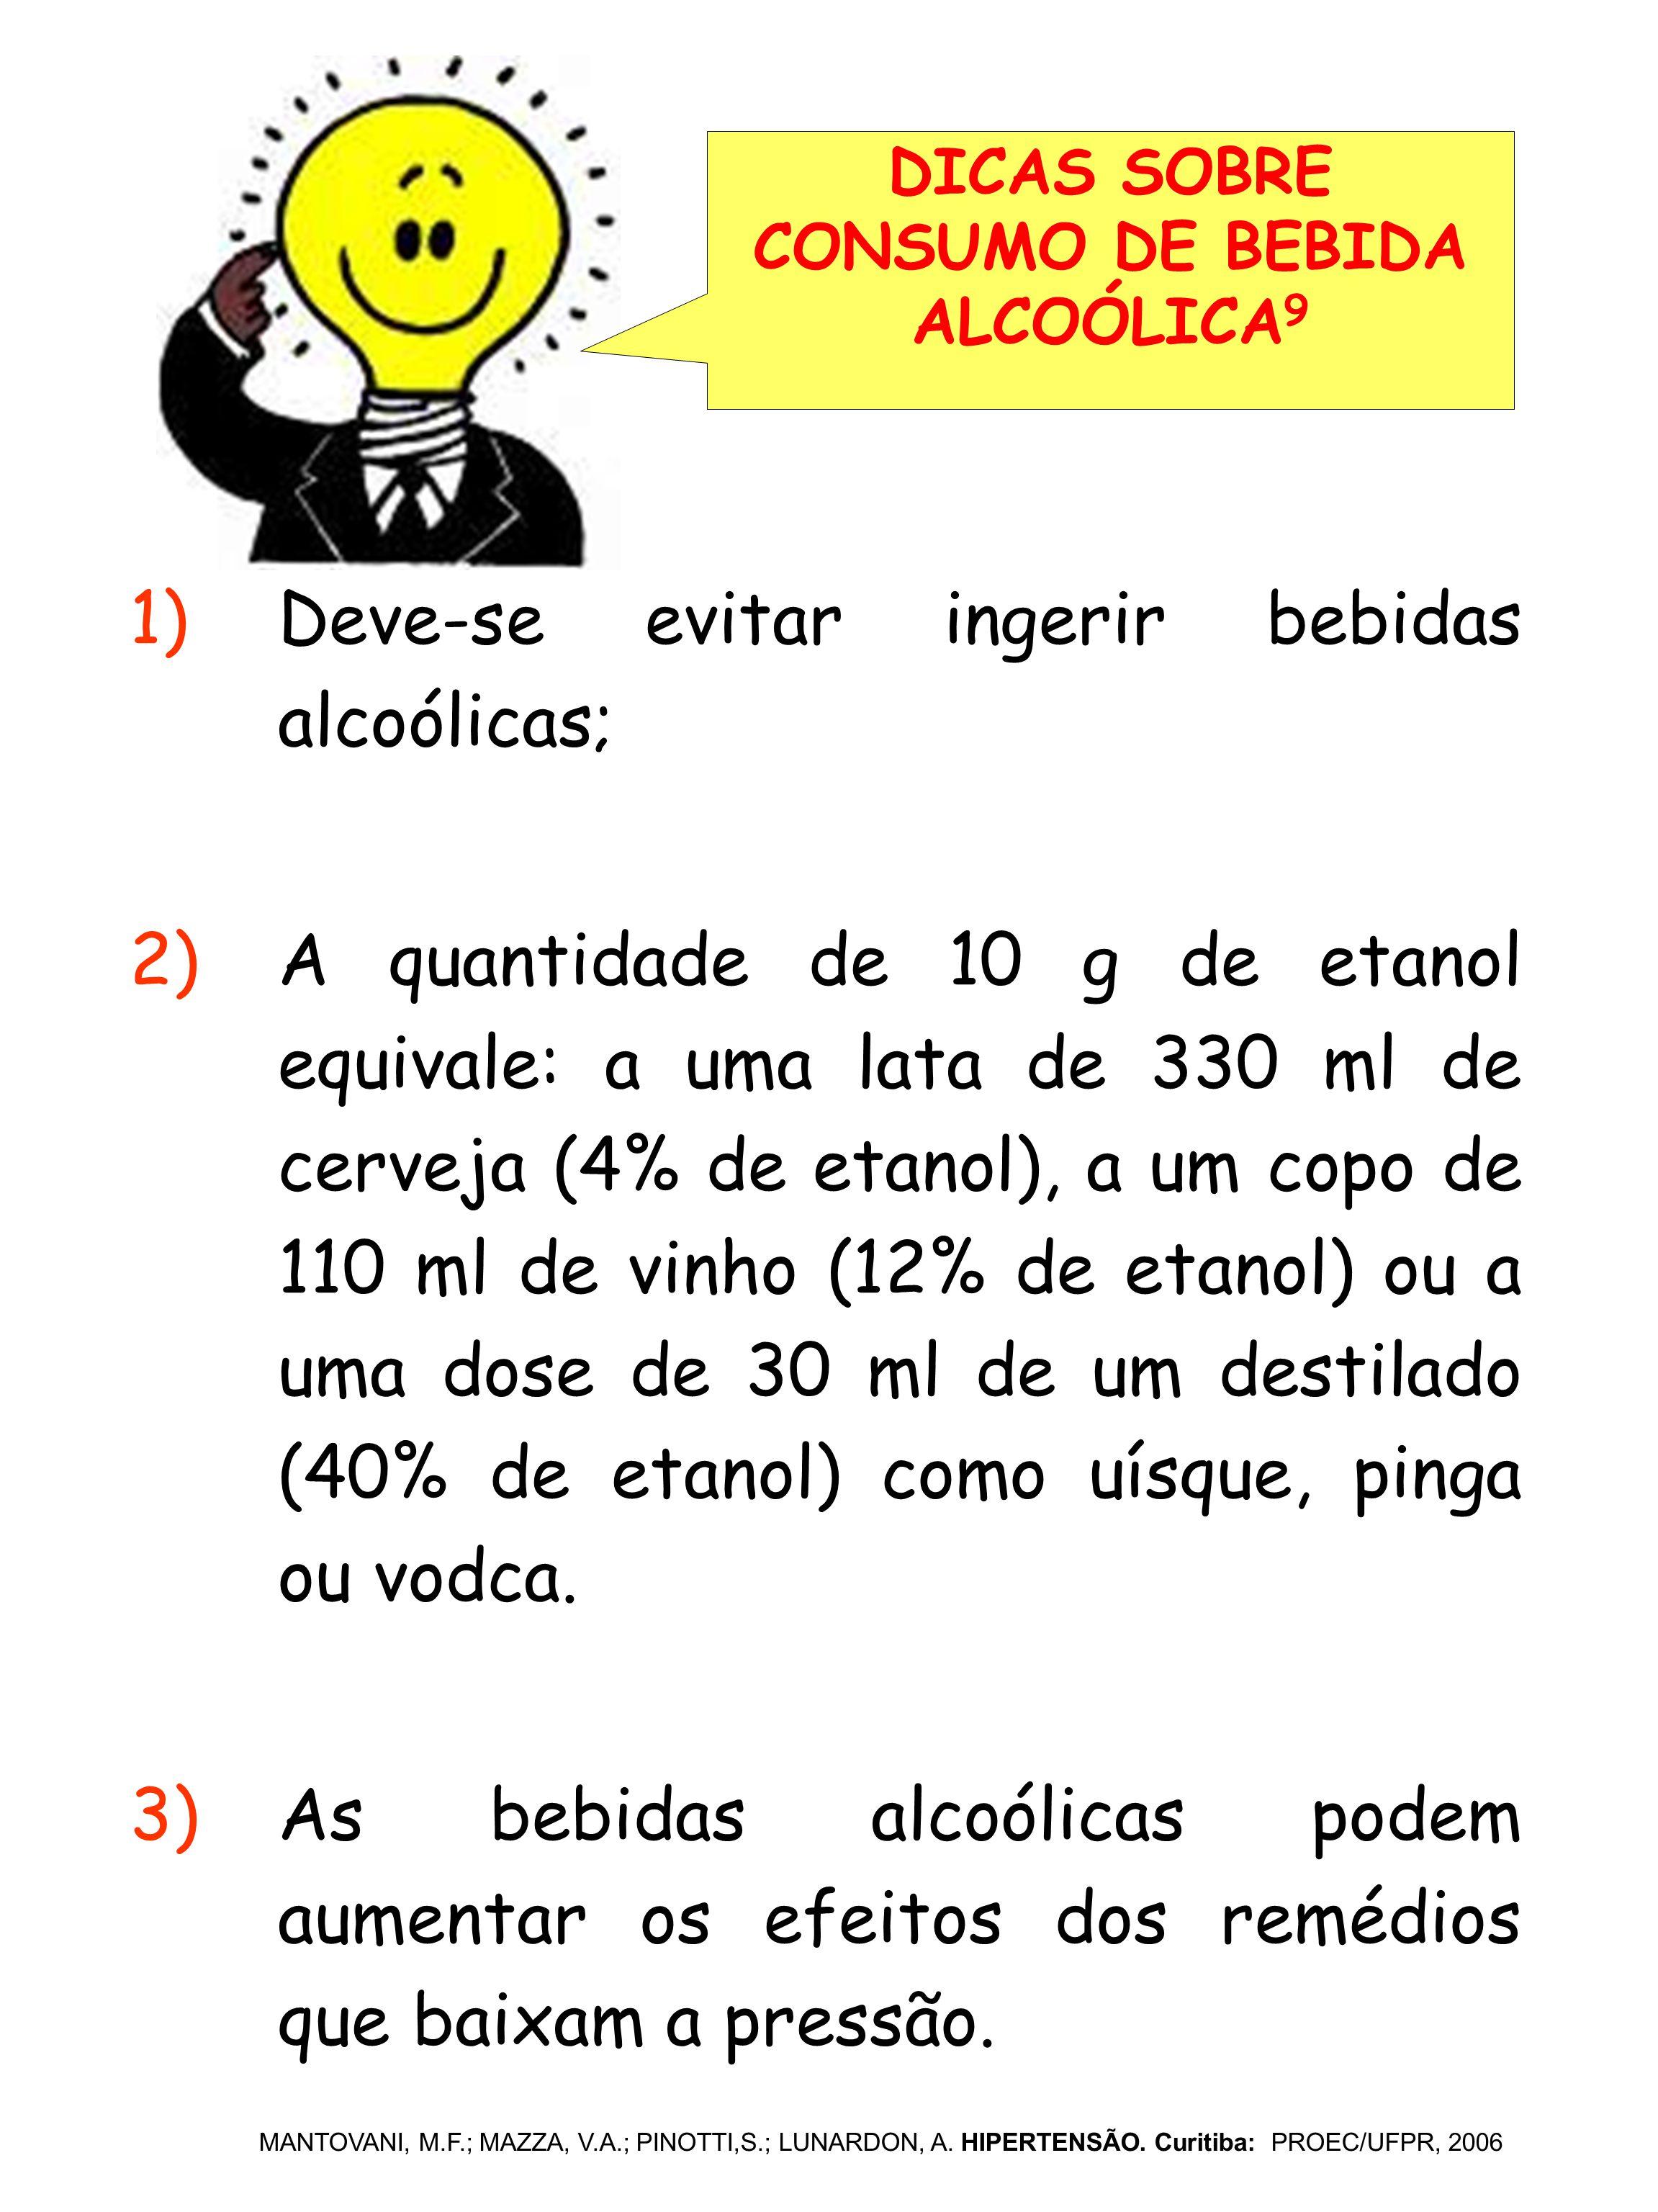 DICAS SOBRE CONSUMO DE BEBIDA ALCOÓLICA9